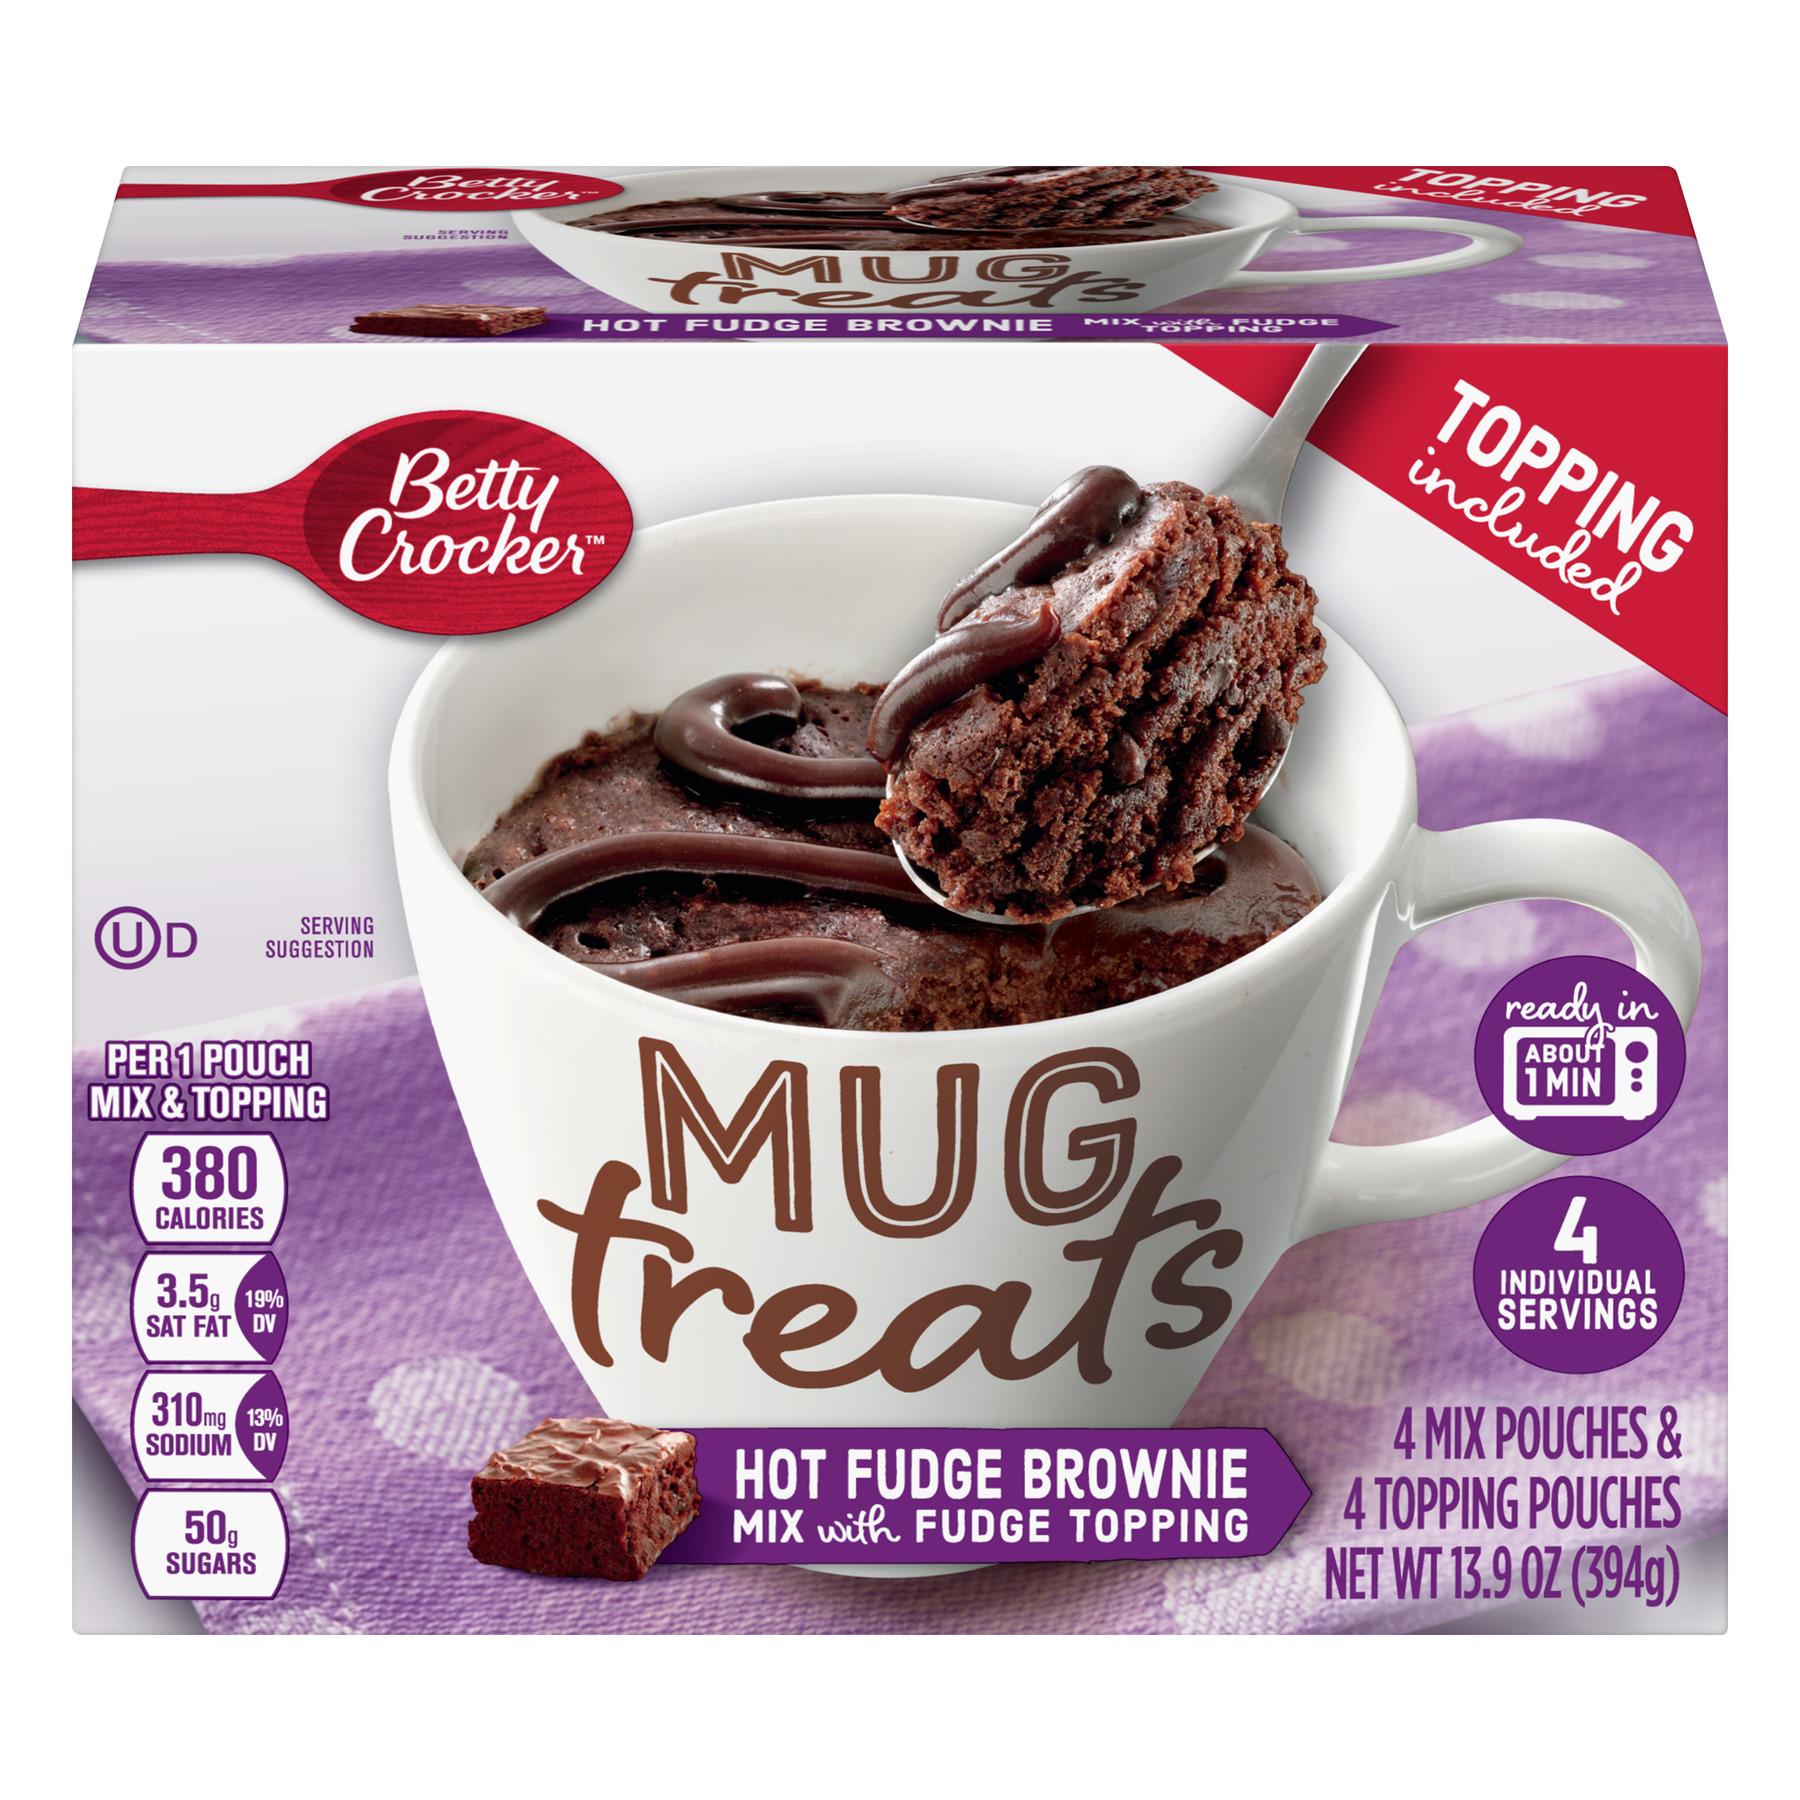 (6 Pack) Betty Crocker Mug Treats Hot Fudge Brownie